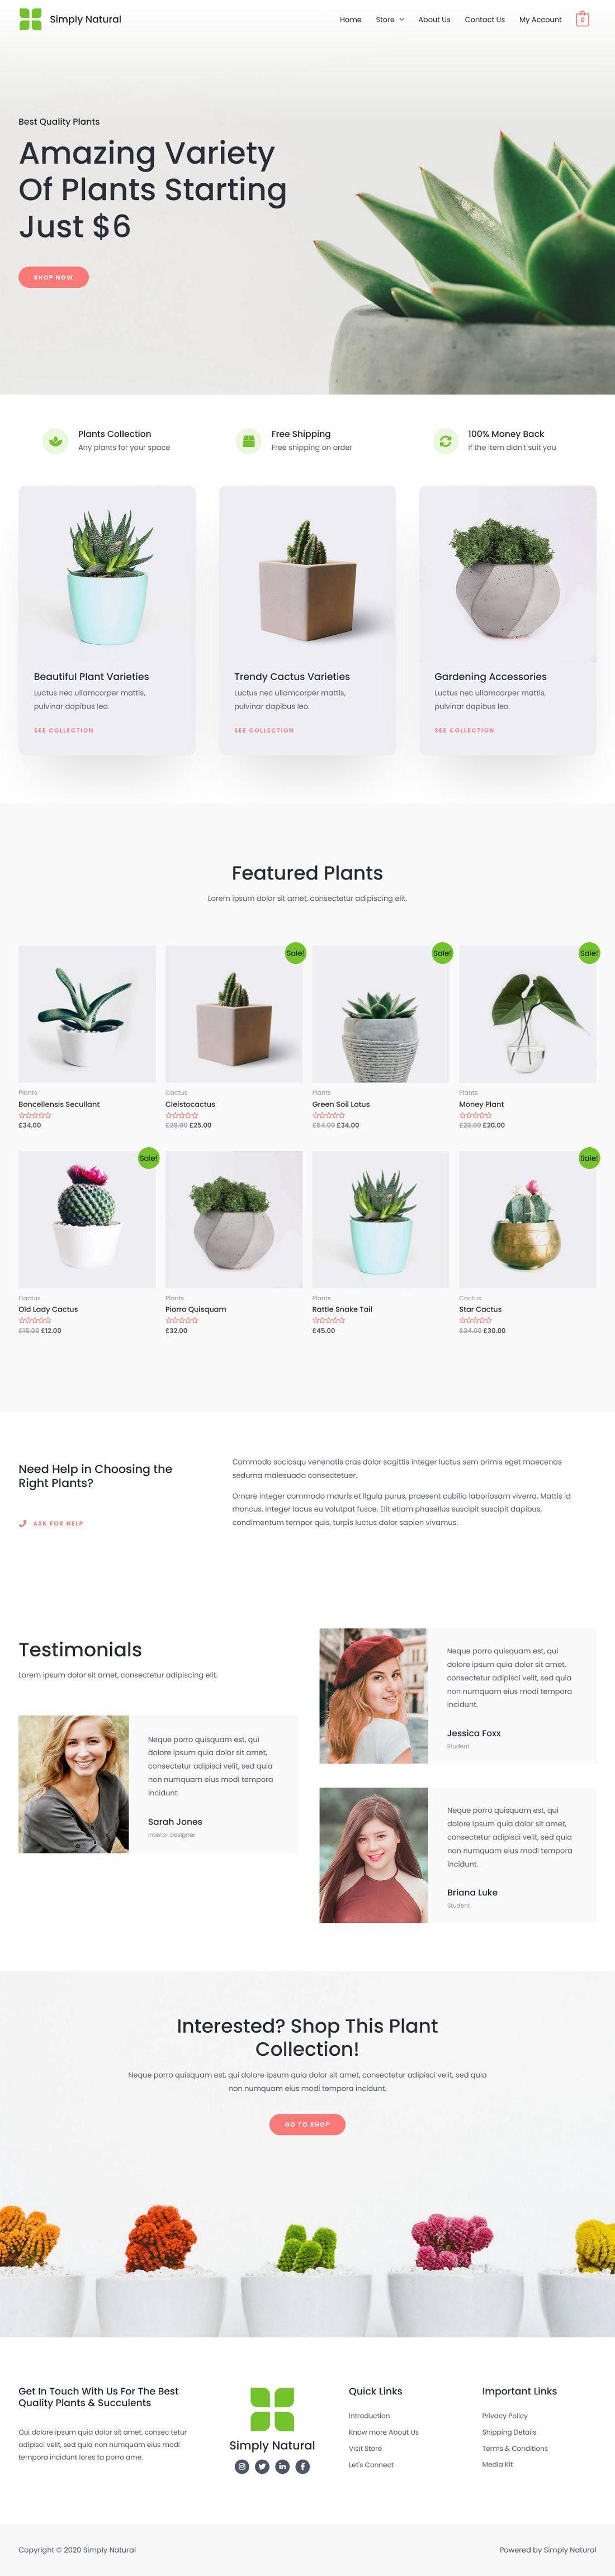 eCom Simply Natural Plant Shop - Multipurpose - Home Page 1280 x 4610